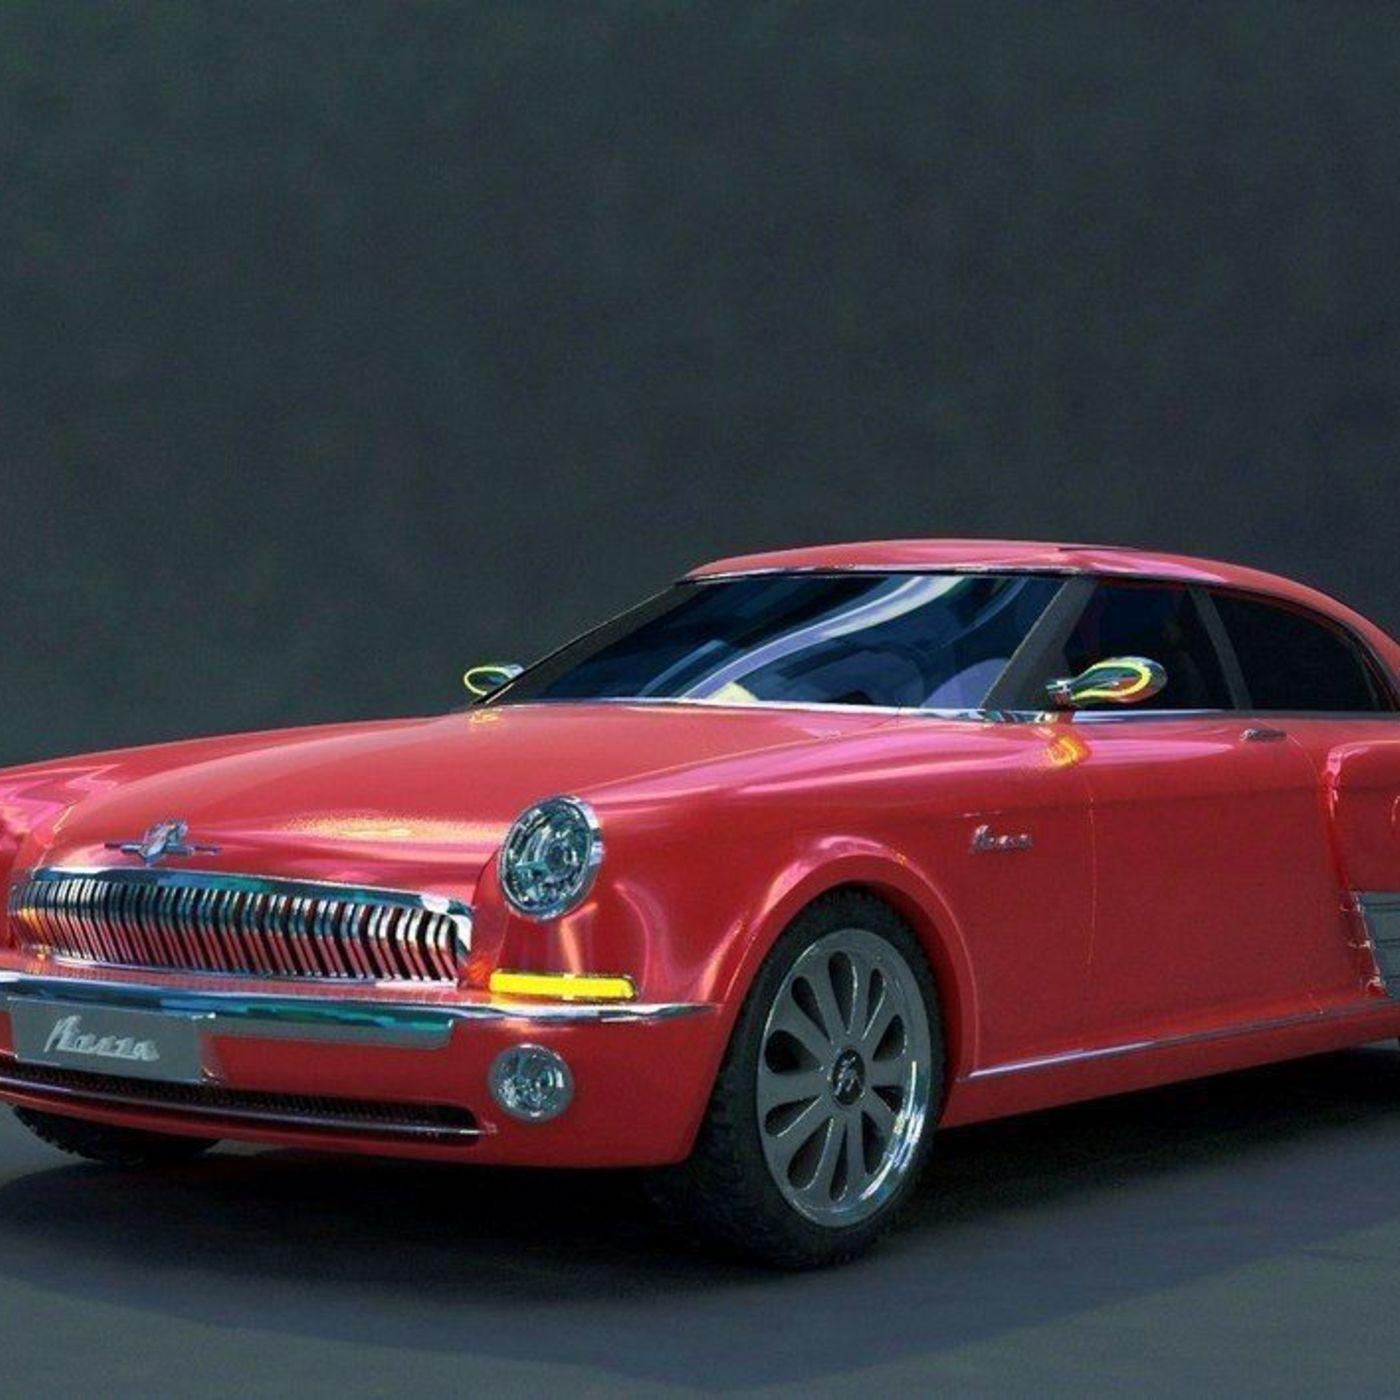 My 3D concept Volga GAZ 21